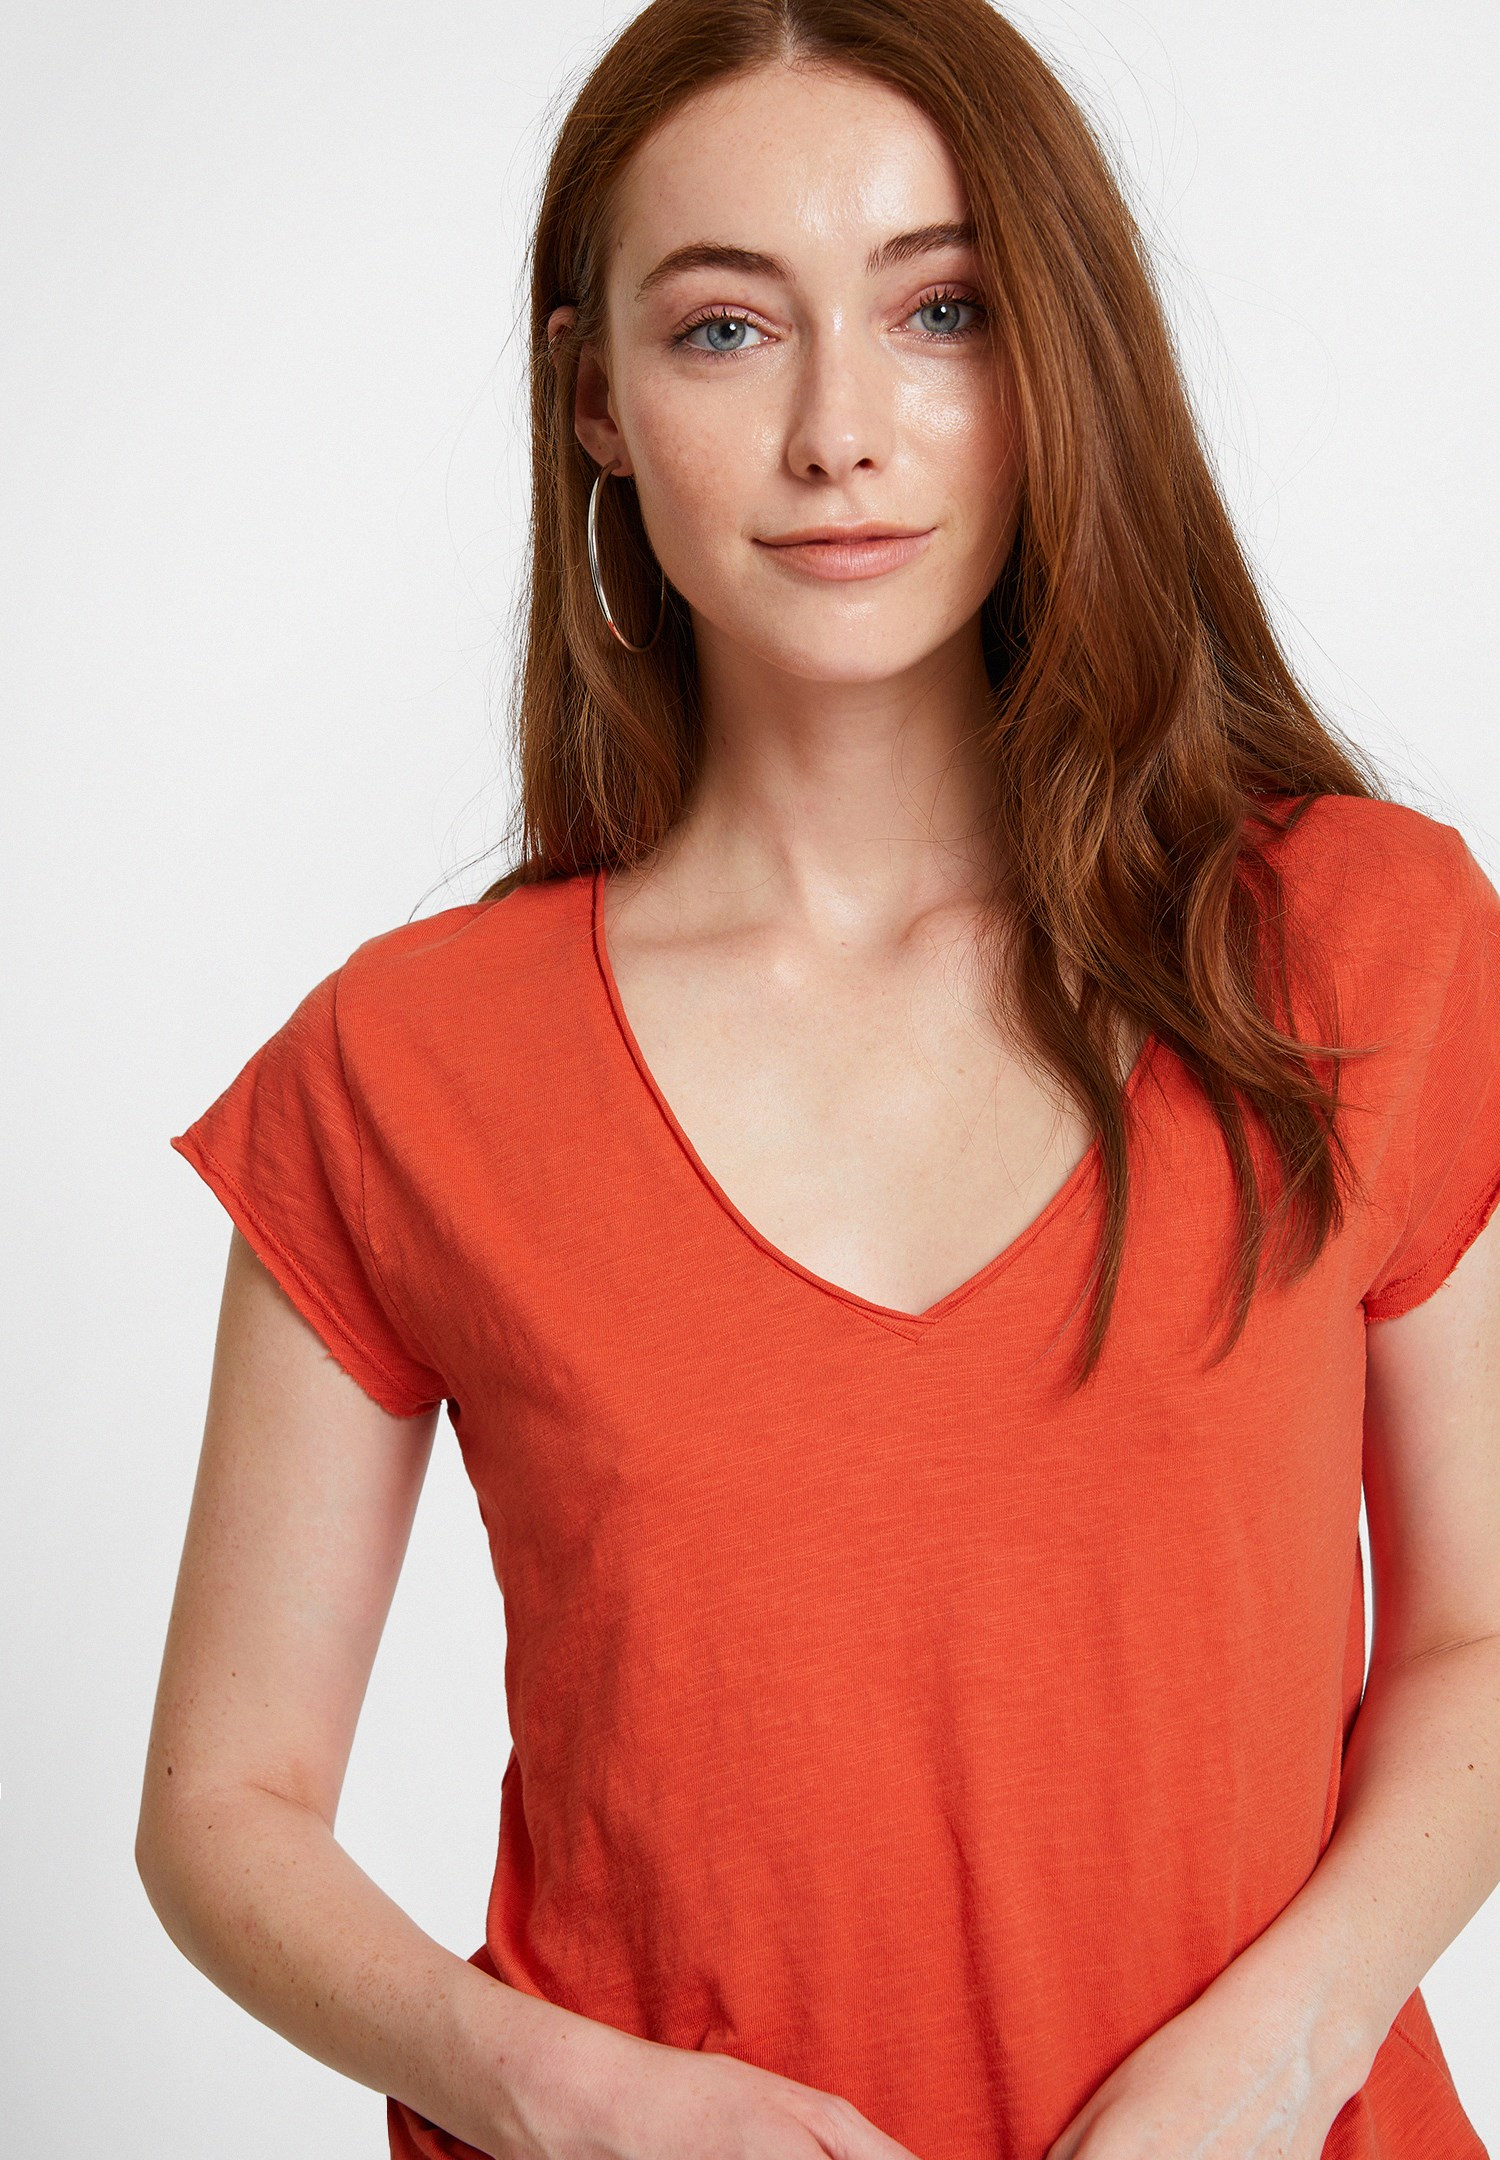 Bayan Turuncu Basic V Yaka Kısa Kollu Tişört